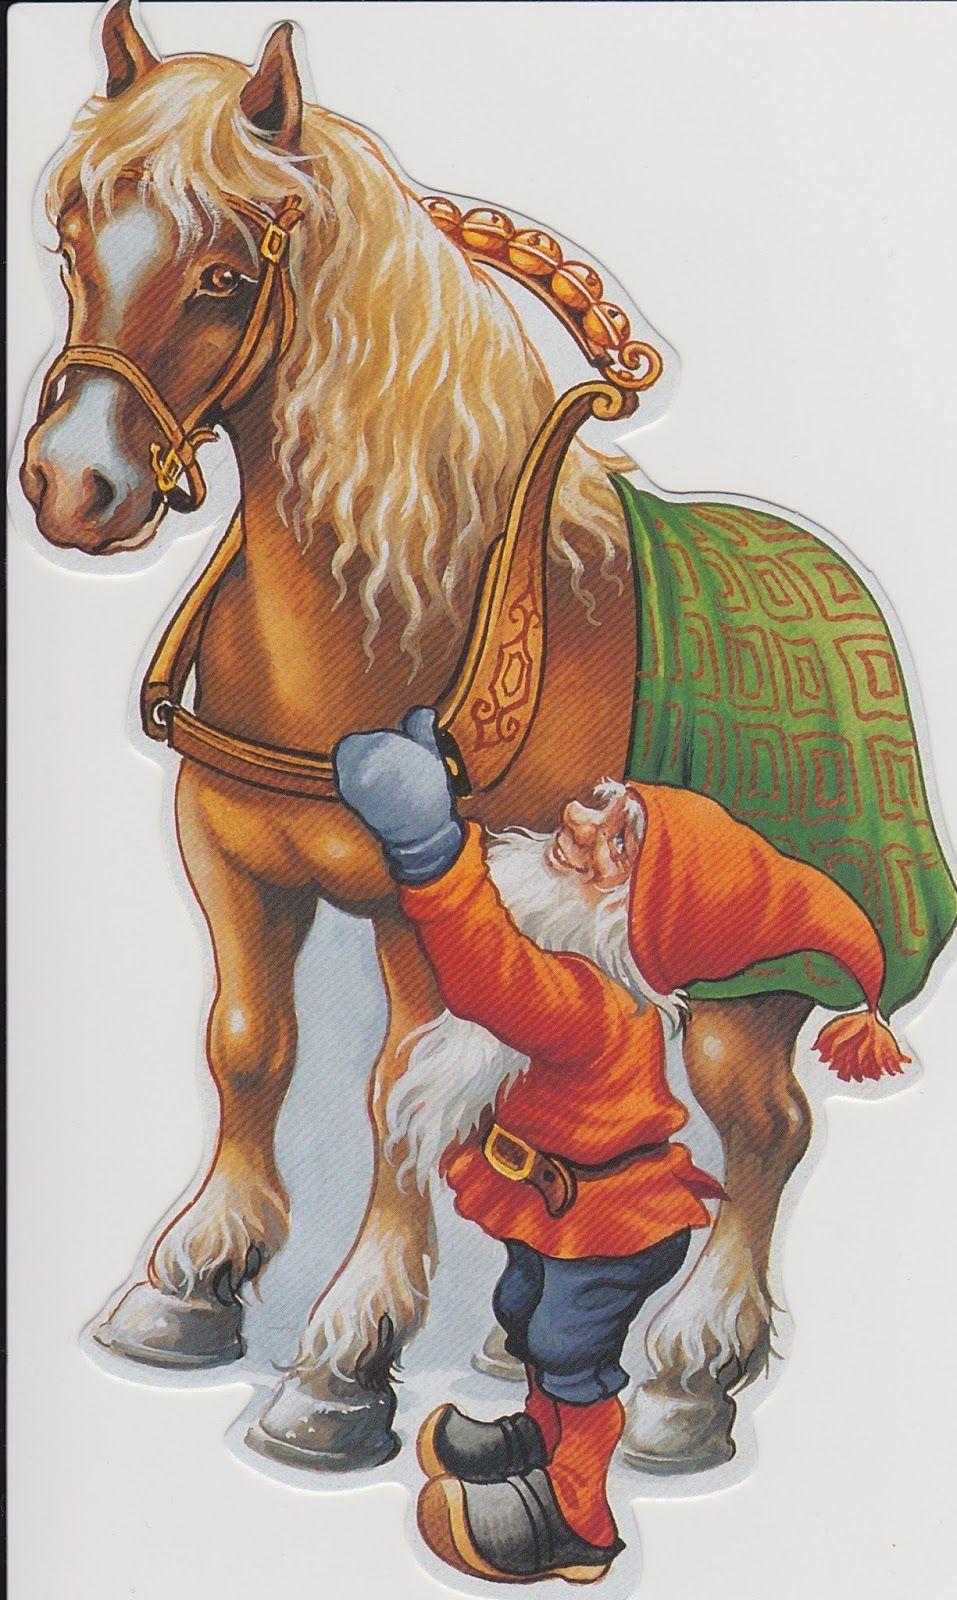 CHRISTMAS GNOME AND PONY CLIP ART